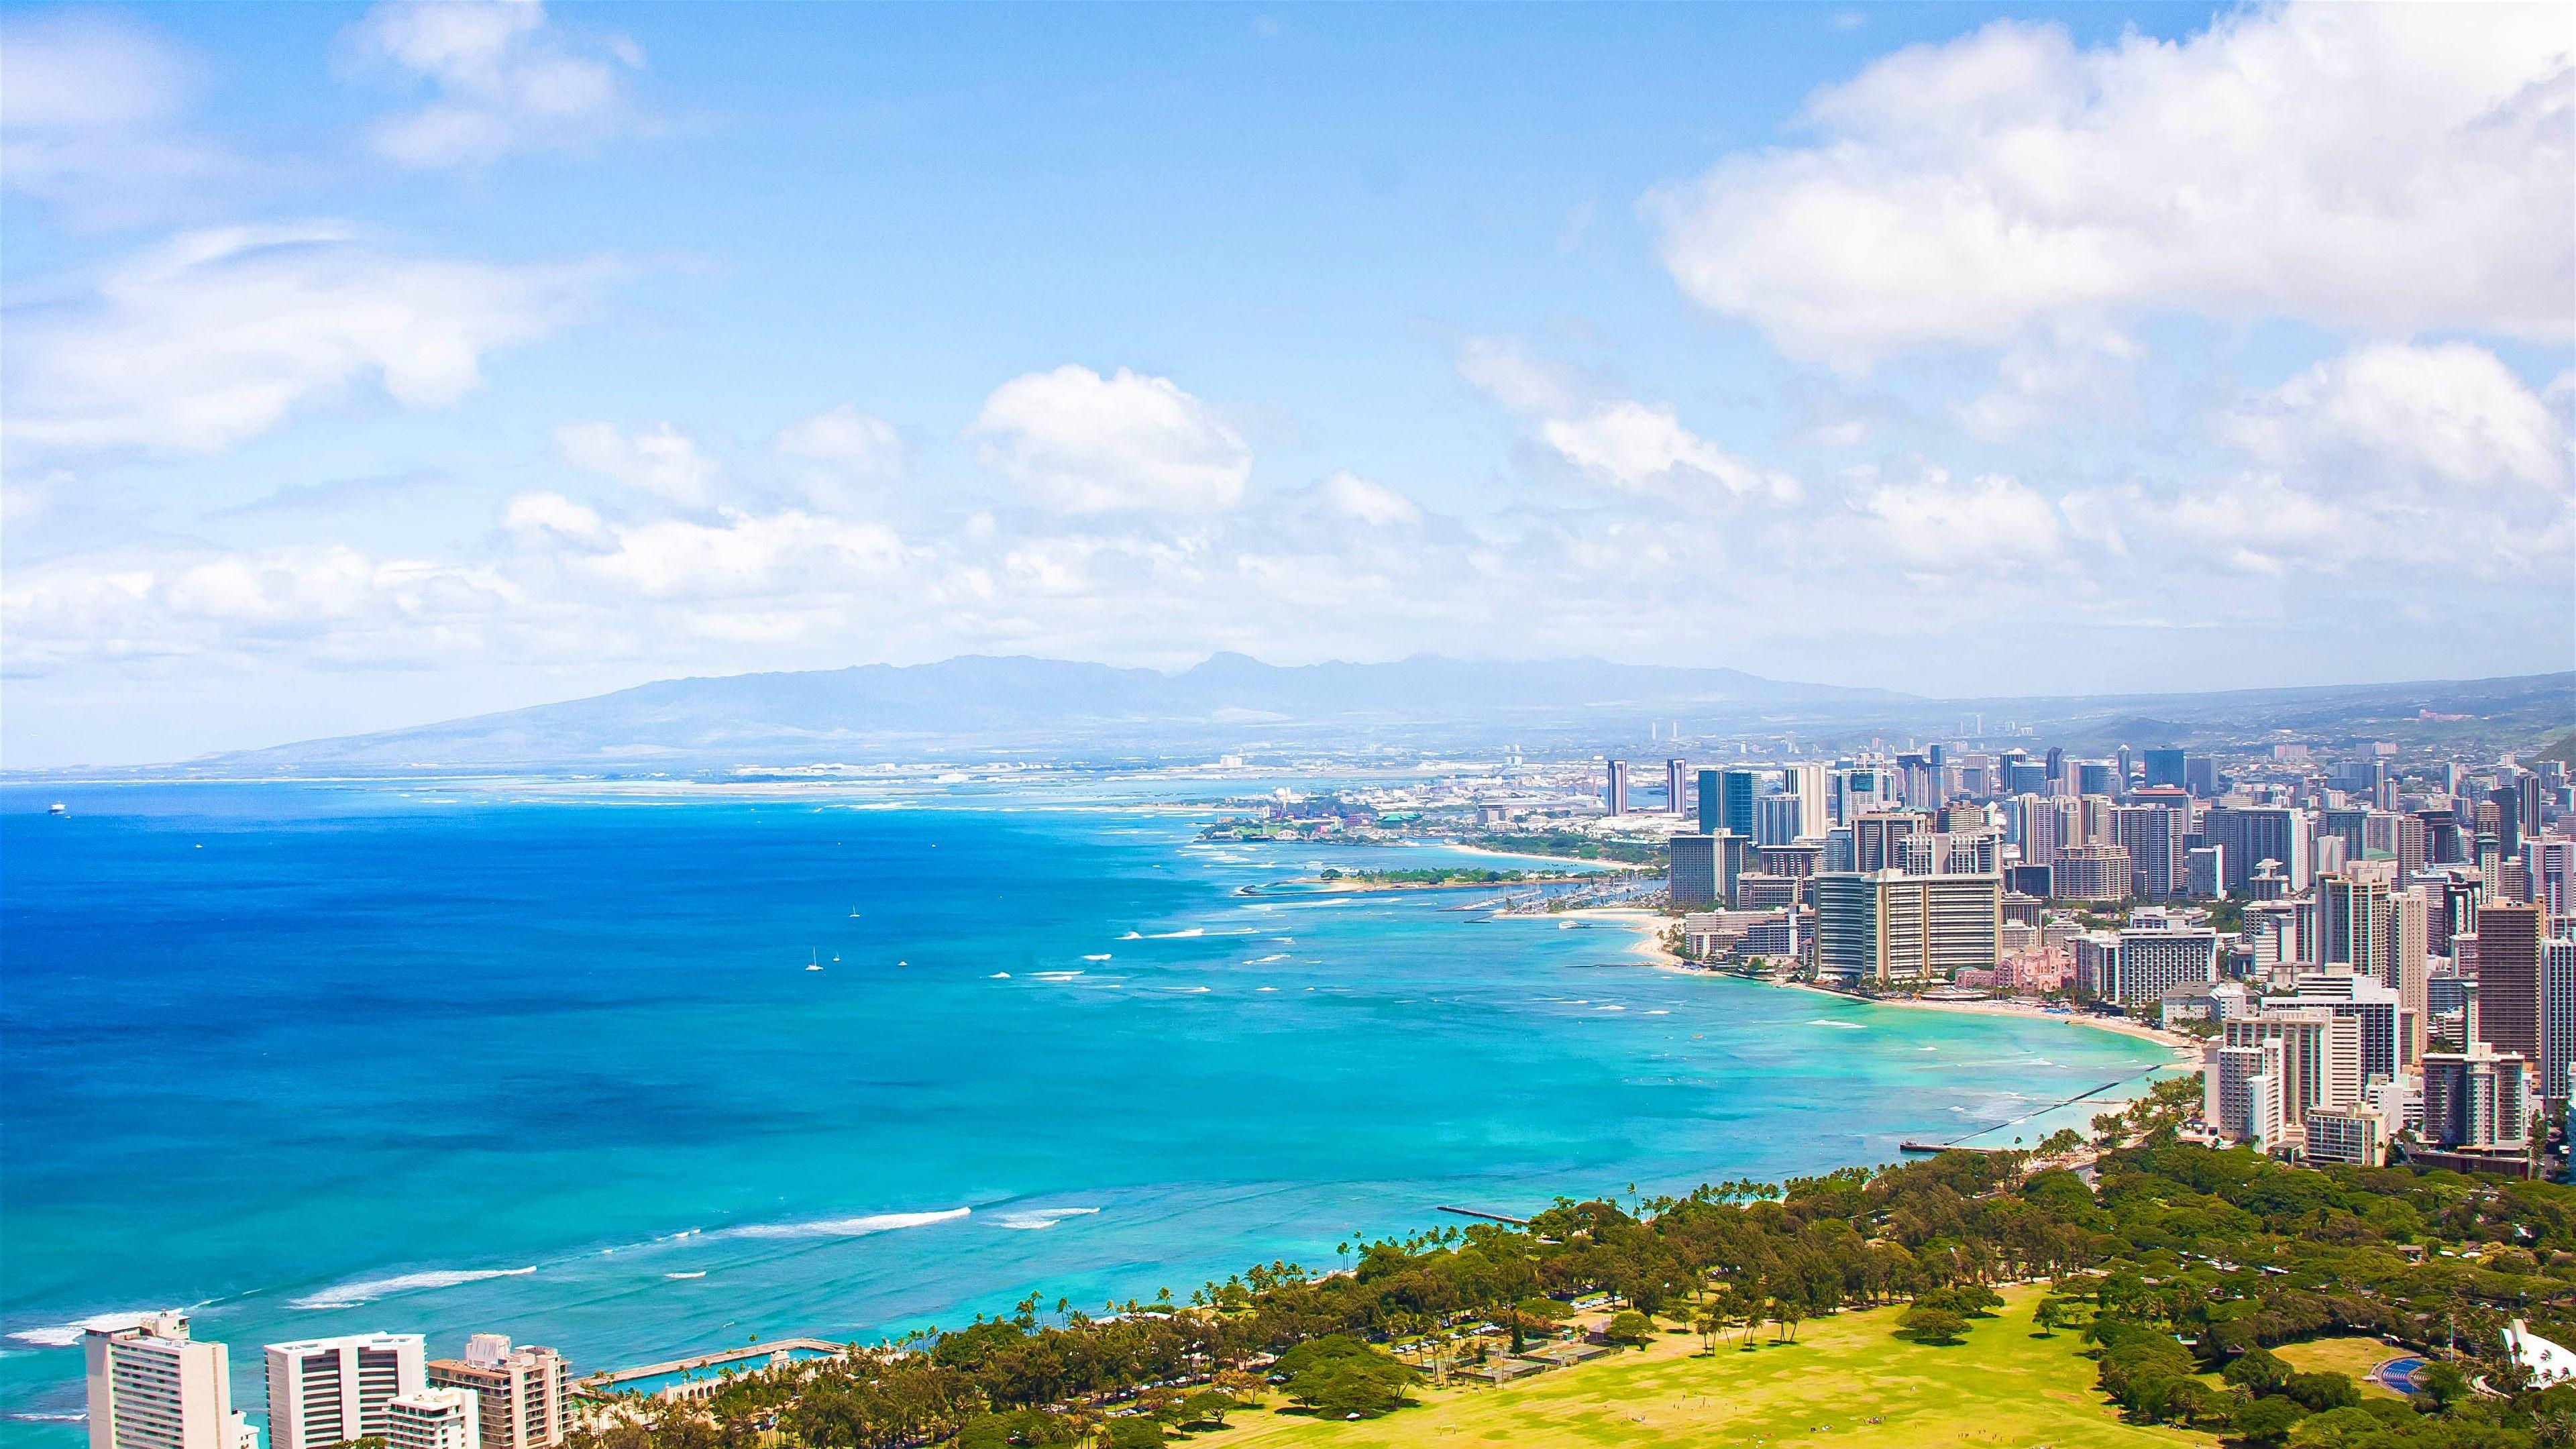 Honolulu Hawaii 3840 X 2160 Honolulu Hawaii Active Wallpaper Desktop Background Images